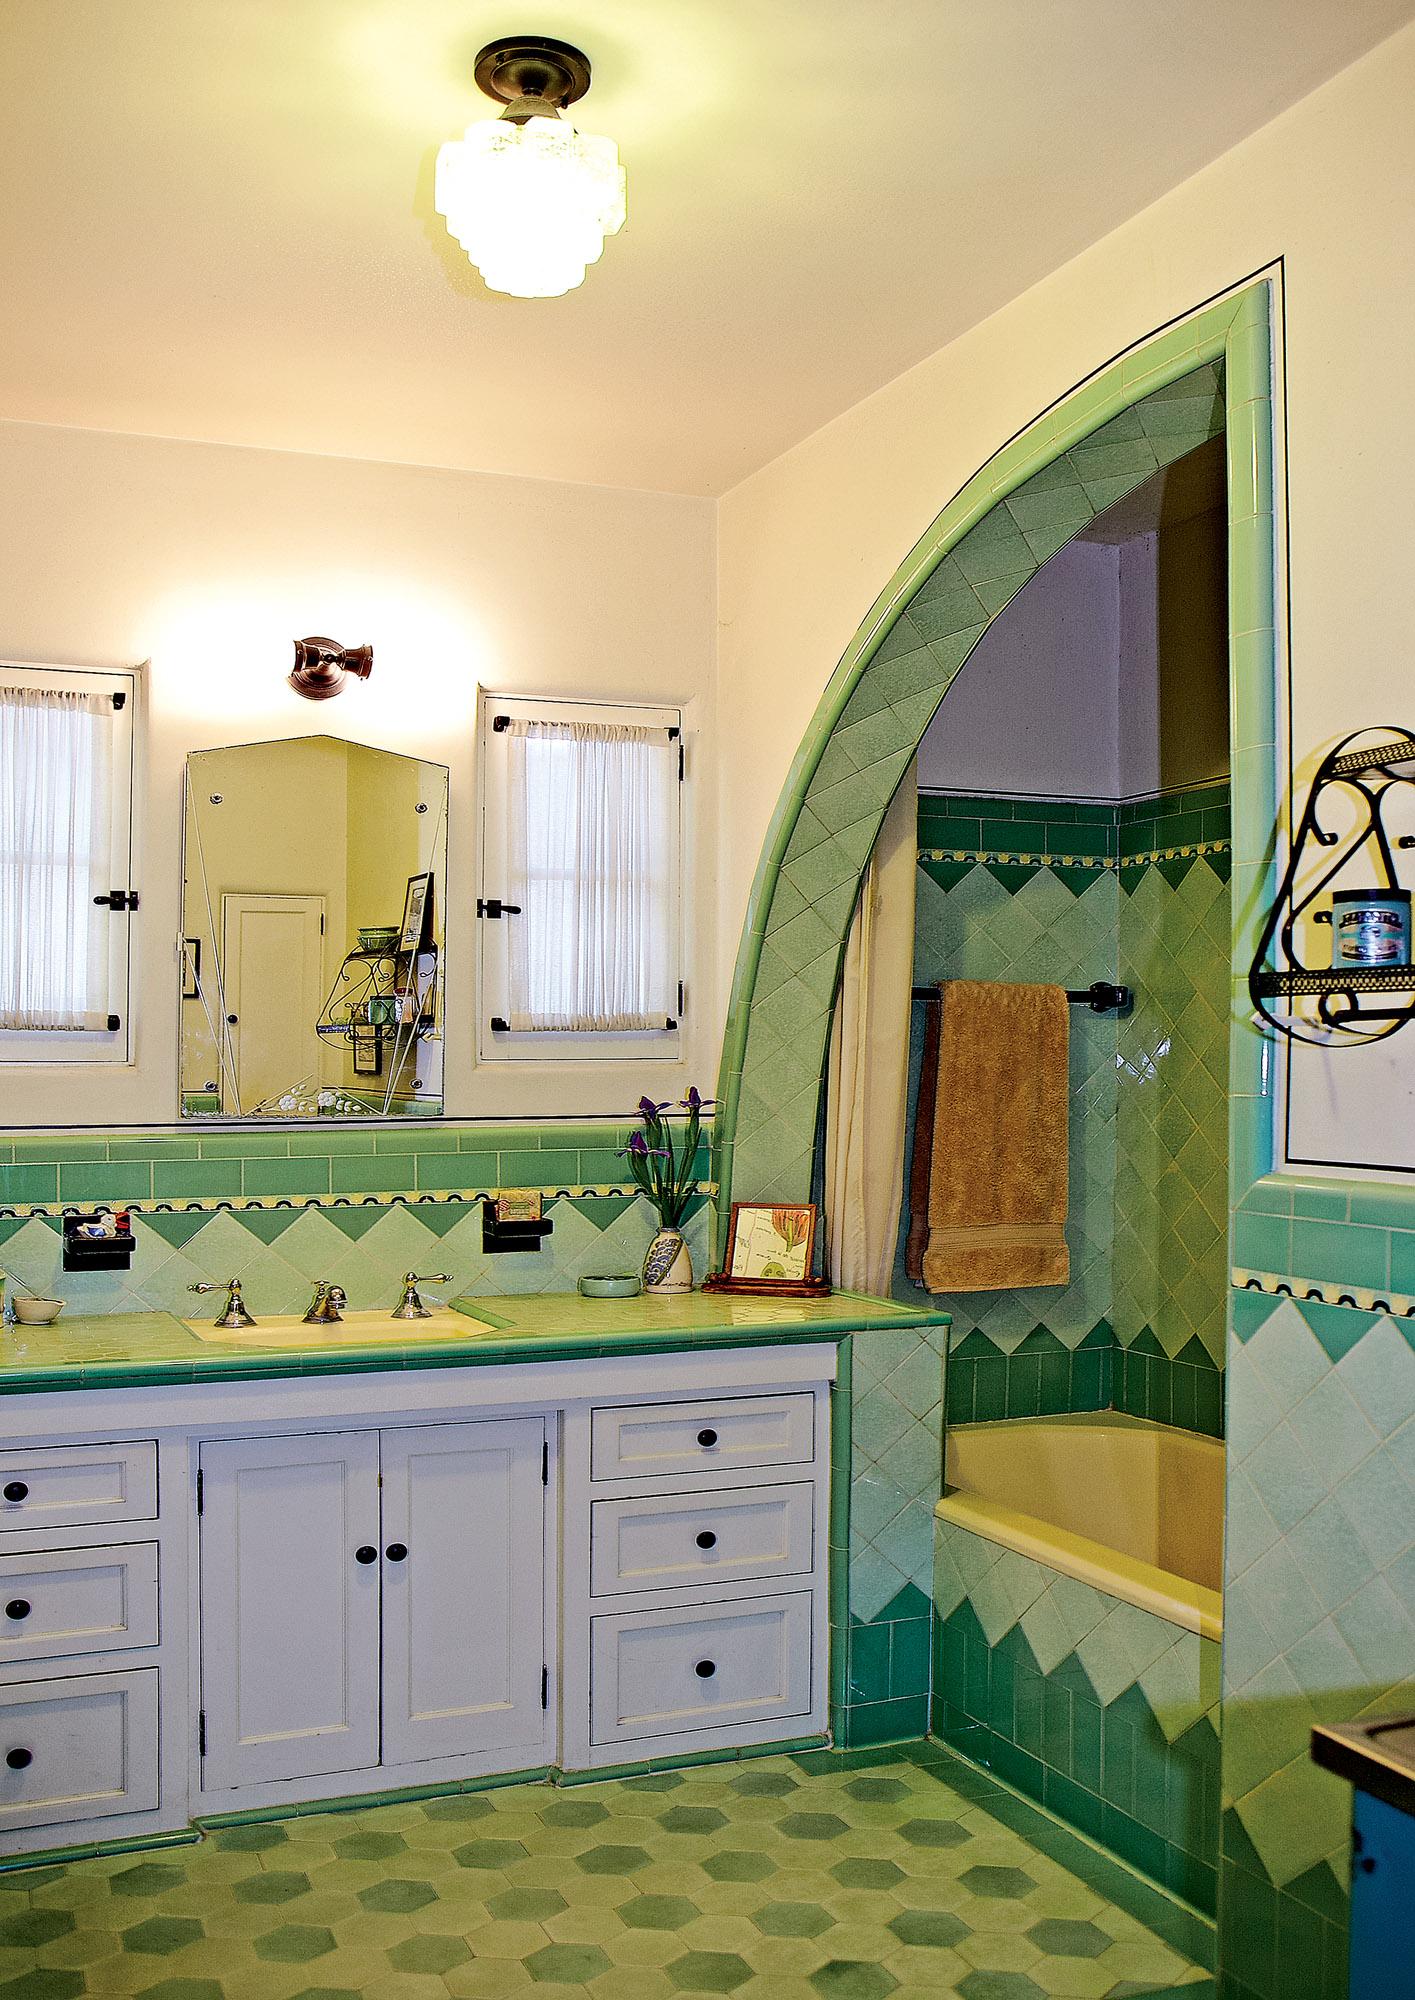 A Bright Art Deco Bathroom - Old House Journal Magazine